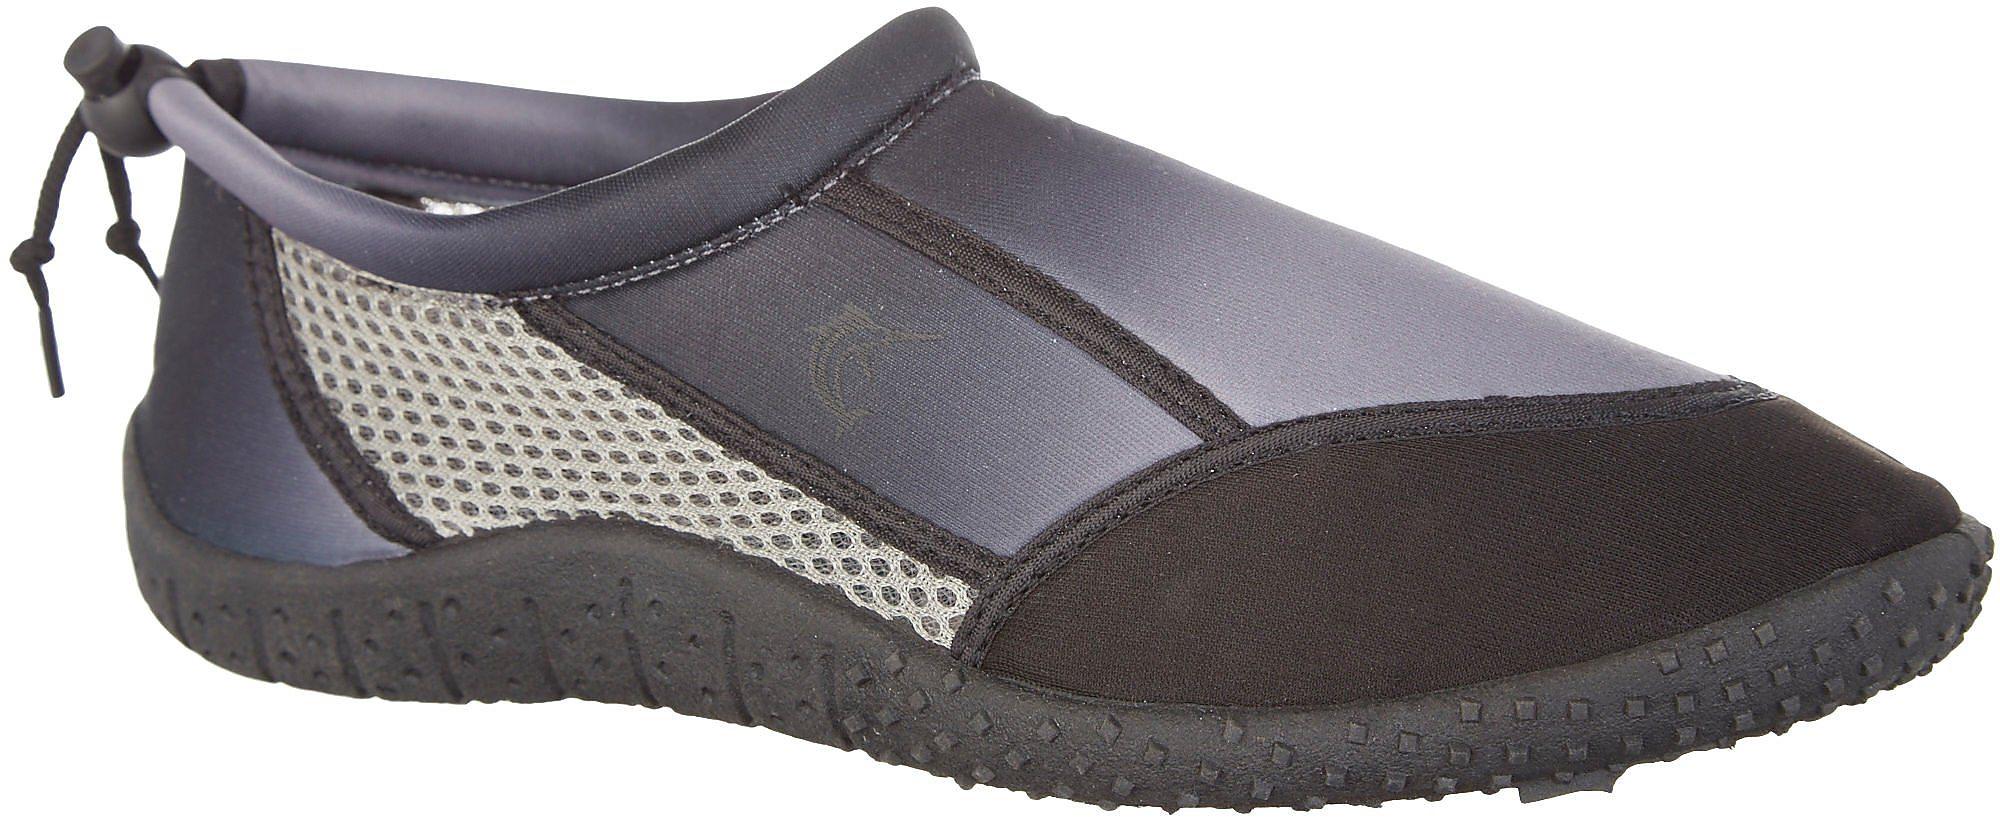 4b74ec7cad0a Reel Legends Mens Gulf Water Shoes